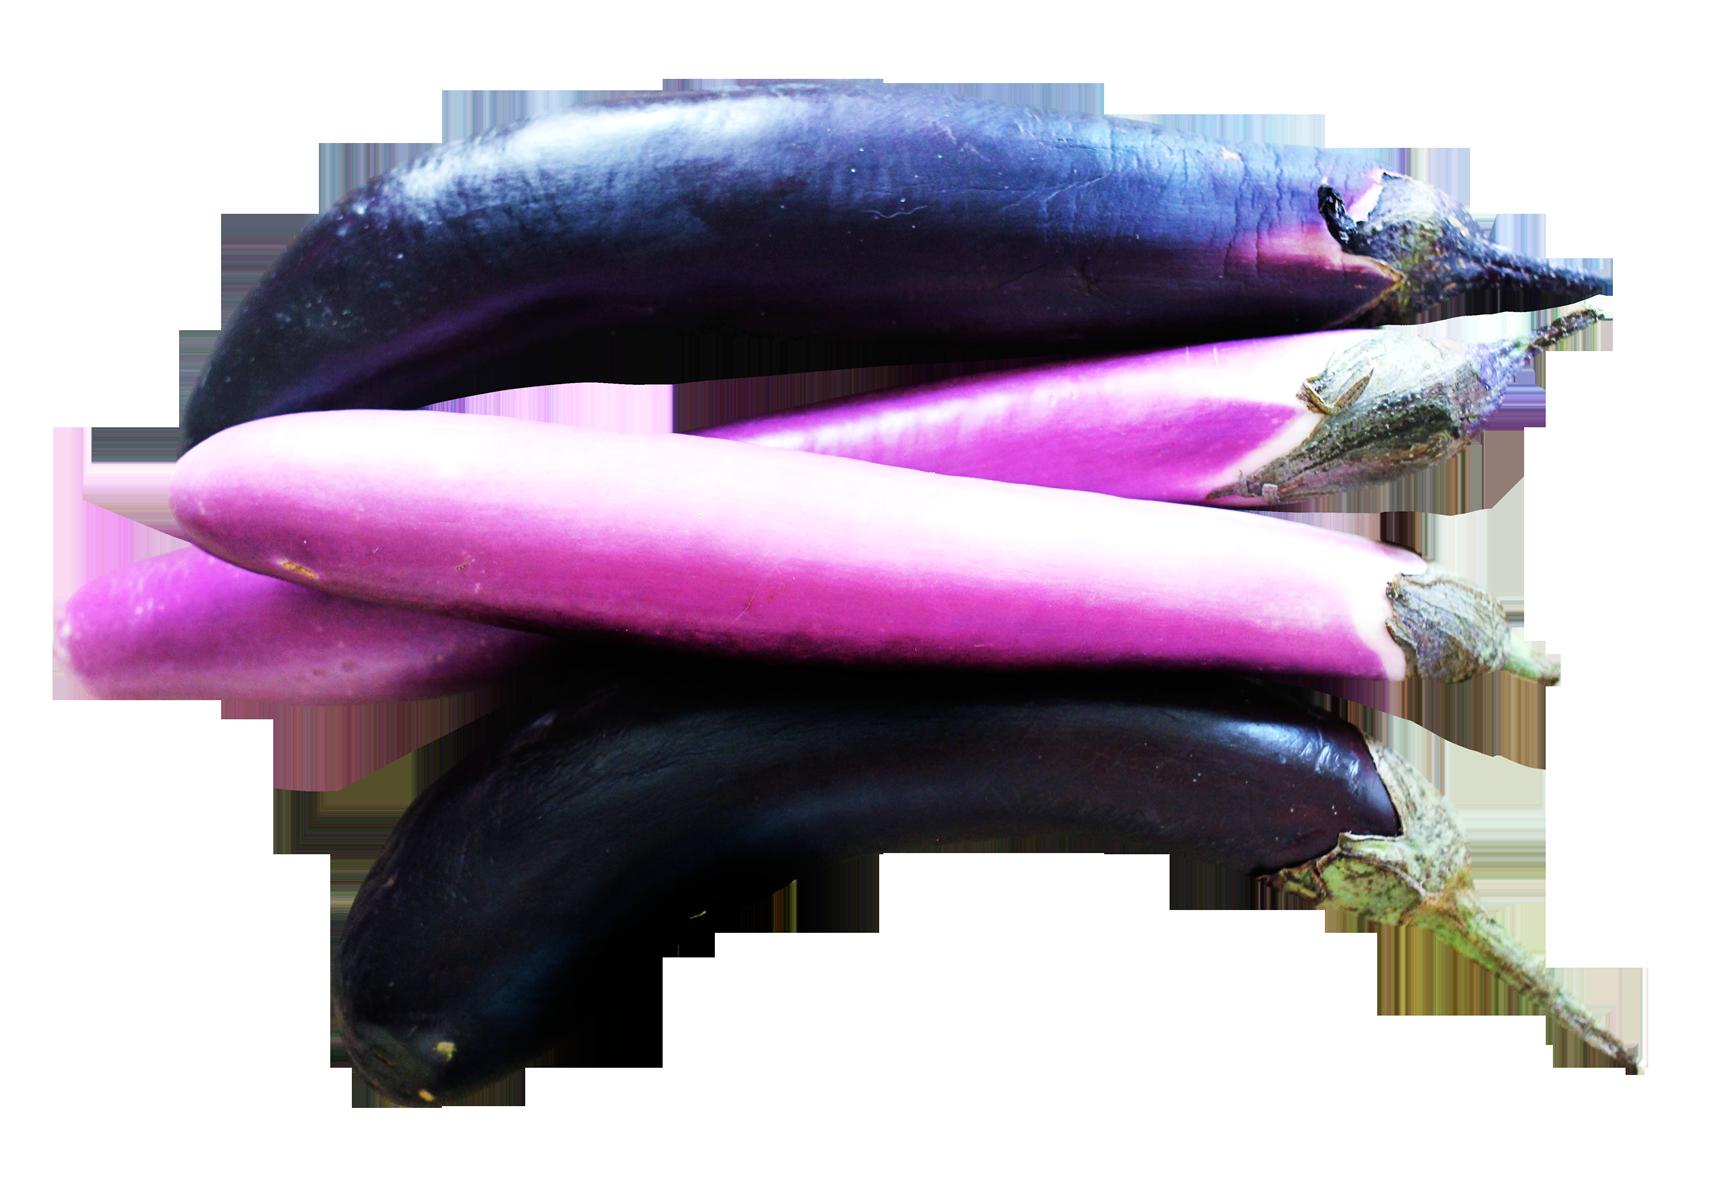 Big Explosion Png Png Image Purepng: Eggplants PNG Image - PurePNG